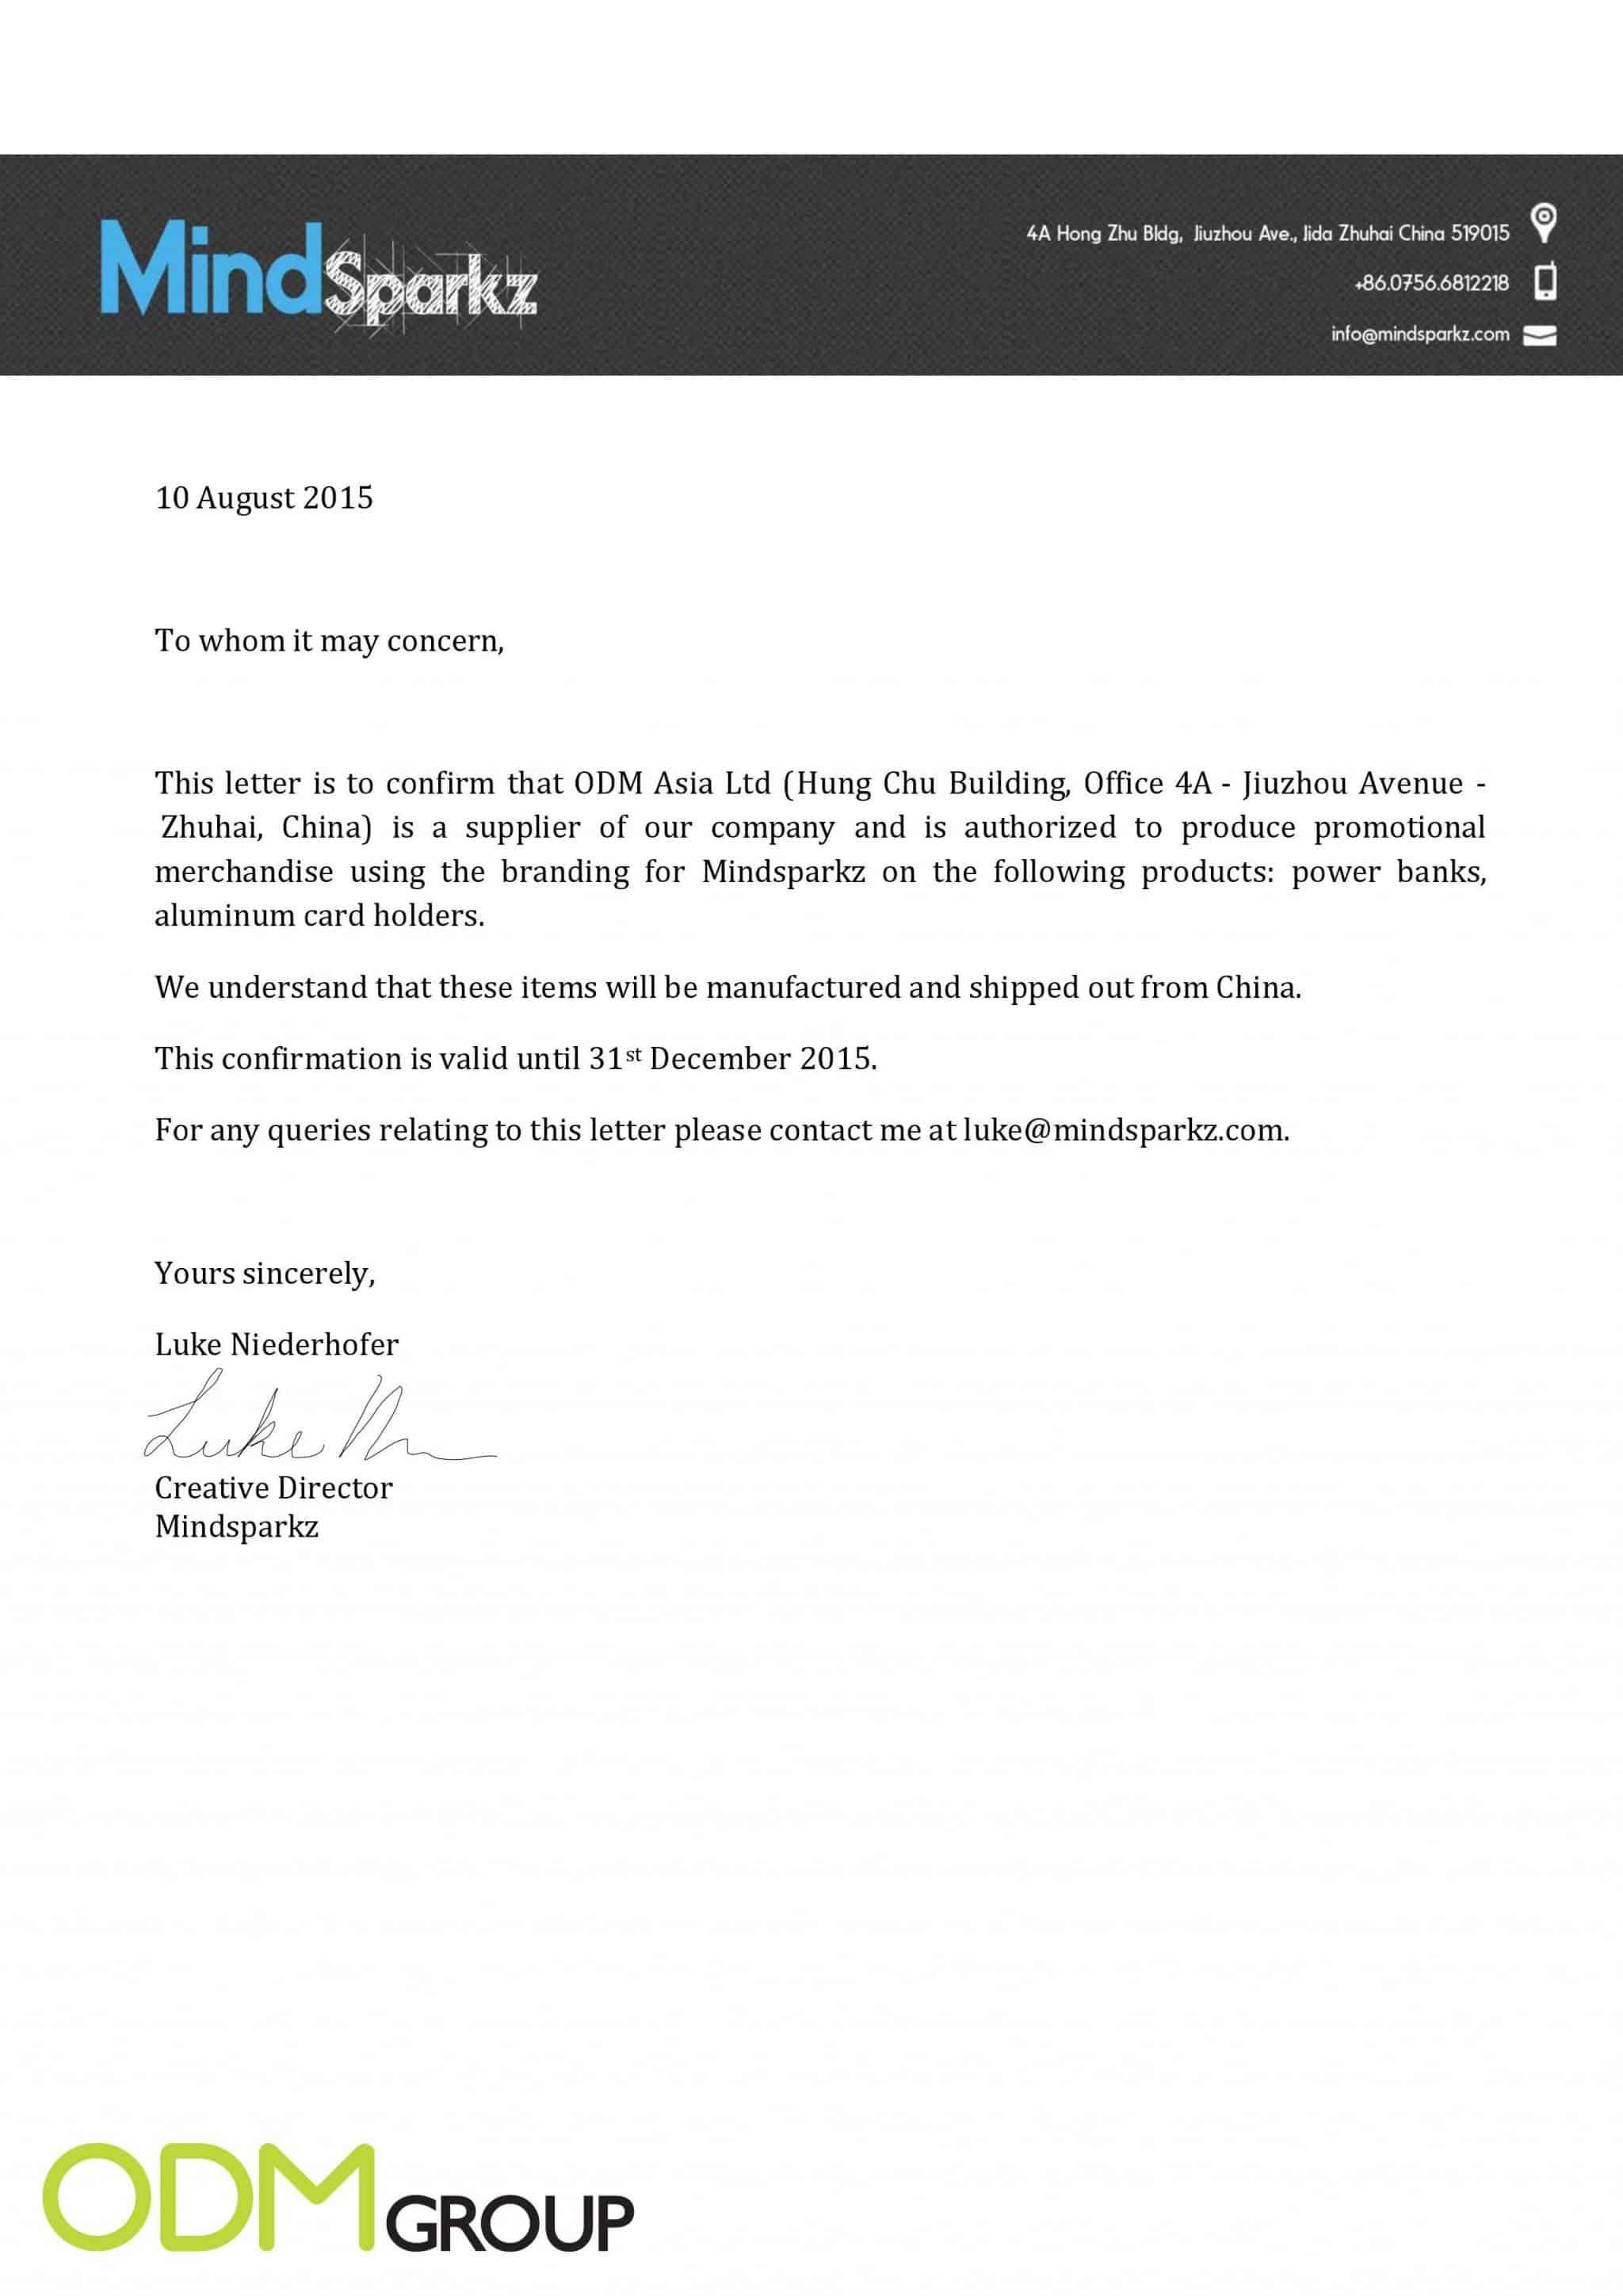 Sample Trademark Clearance Letter